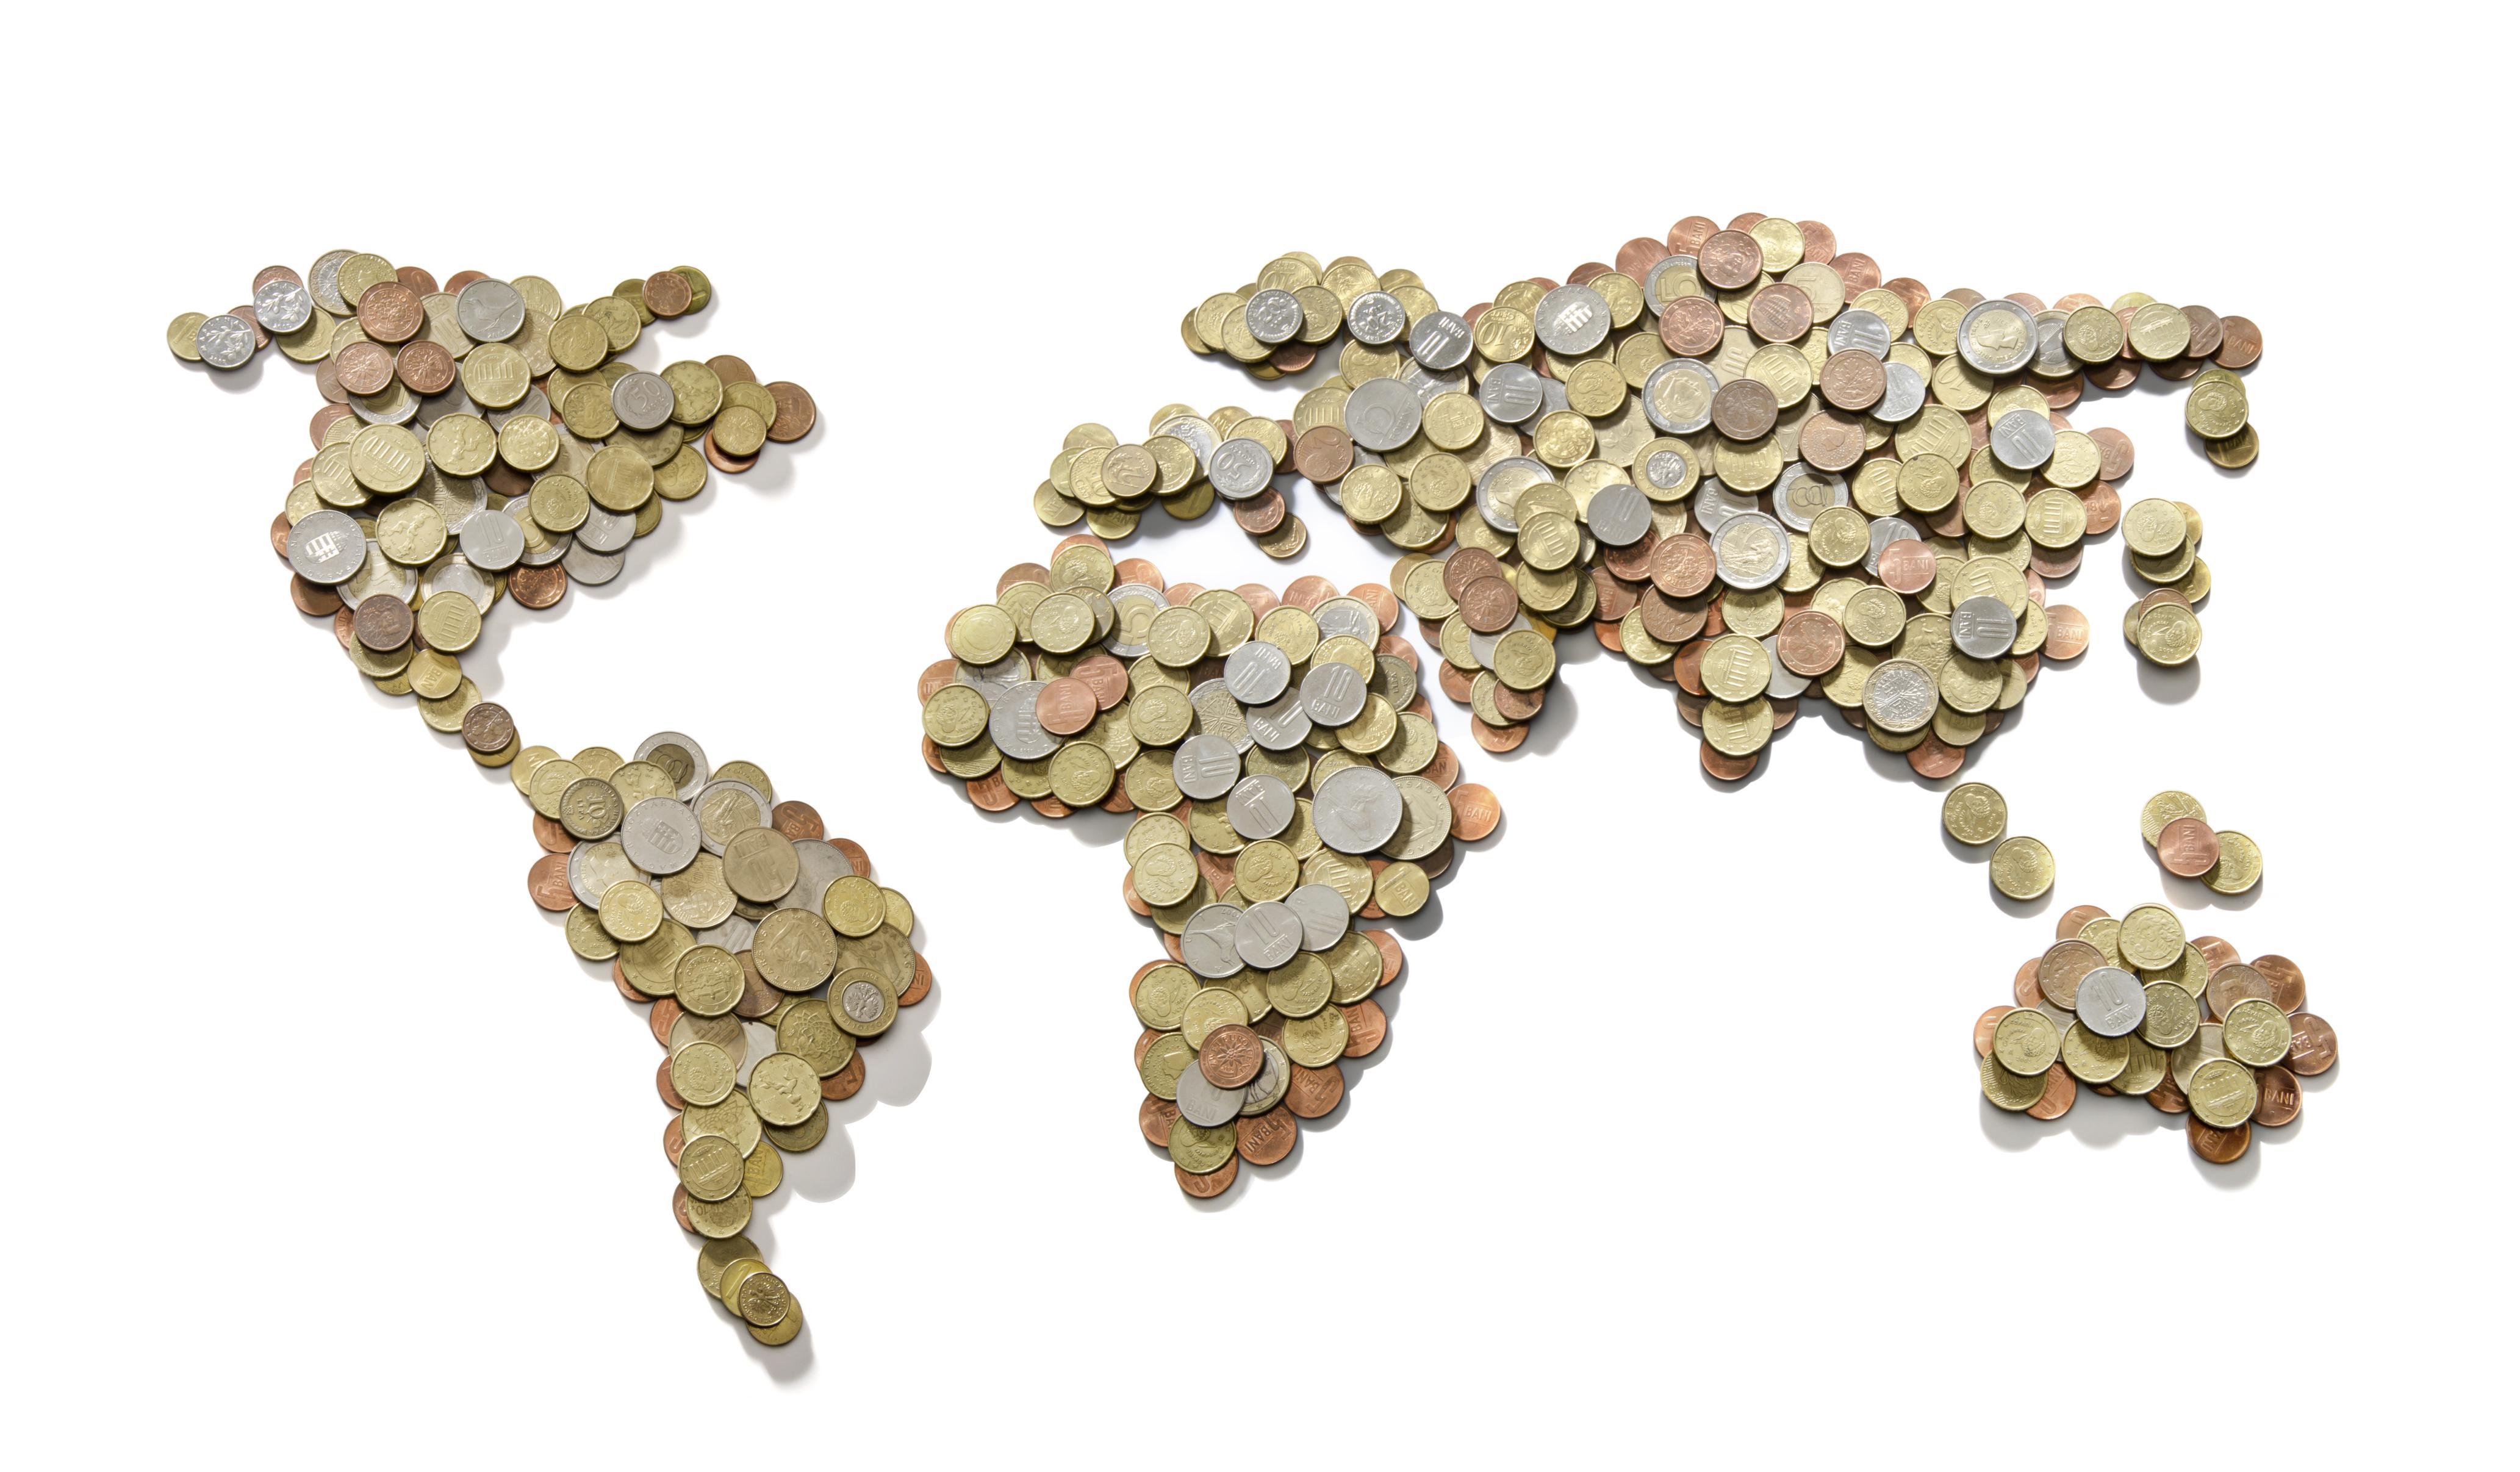 ACTU - mondialisation